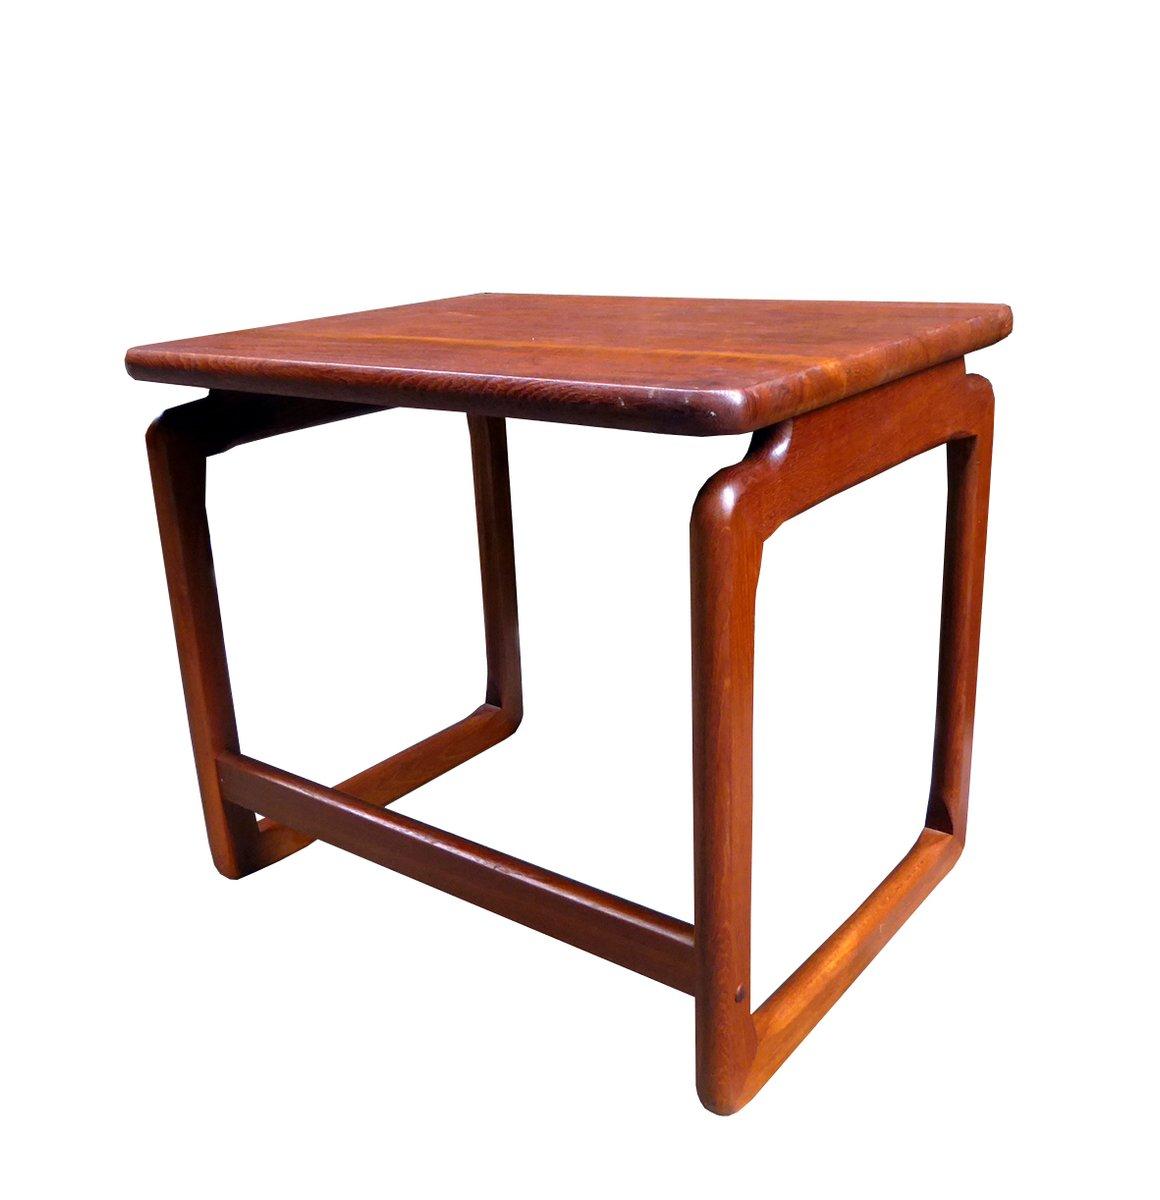 Teak Atomic Coffee Table: Danish Teak Coffee Table, 1950s For Sale At Pamono